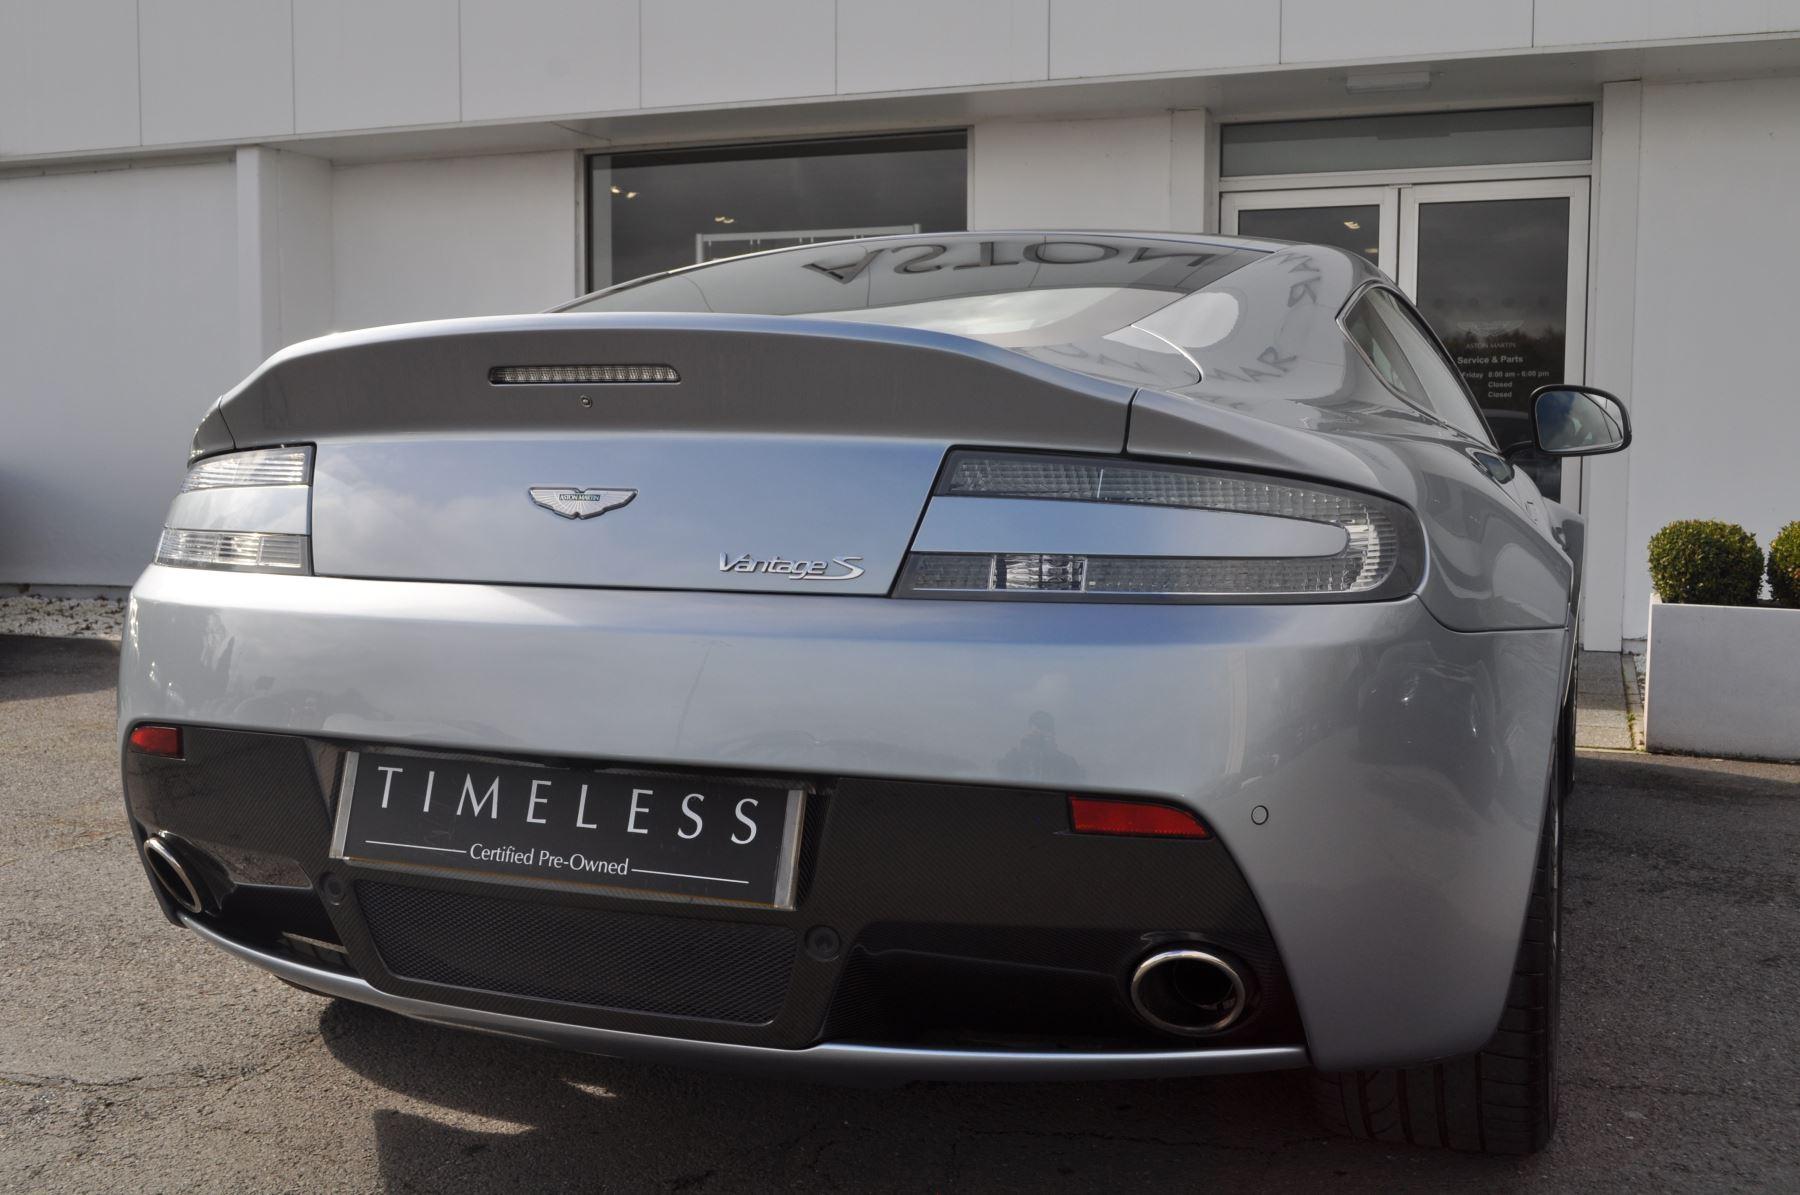 Aston Martin V8 Vantage S Coupe Coupe image 13